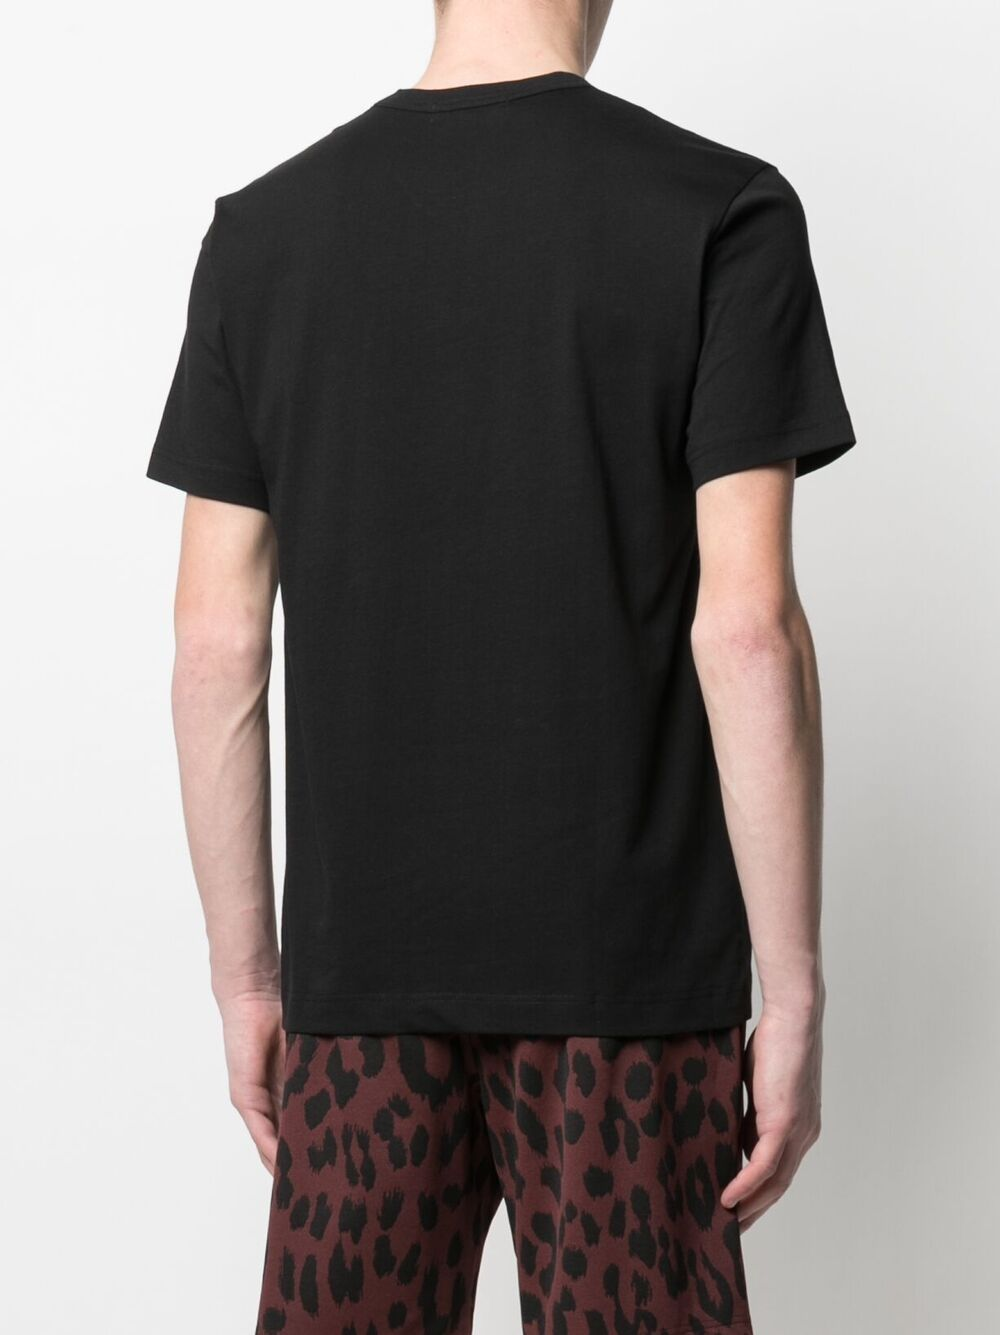 Comme Des Garçons Shirt t-shirt con logo stampato uomo COMME DES GARÇONS SHIRT   T-shirt   FG-T018BLACK